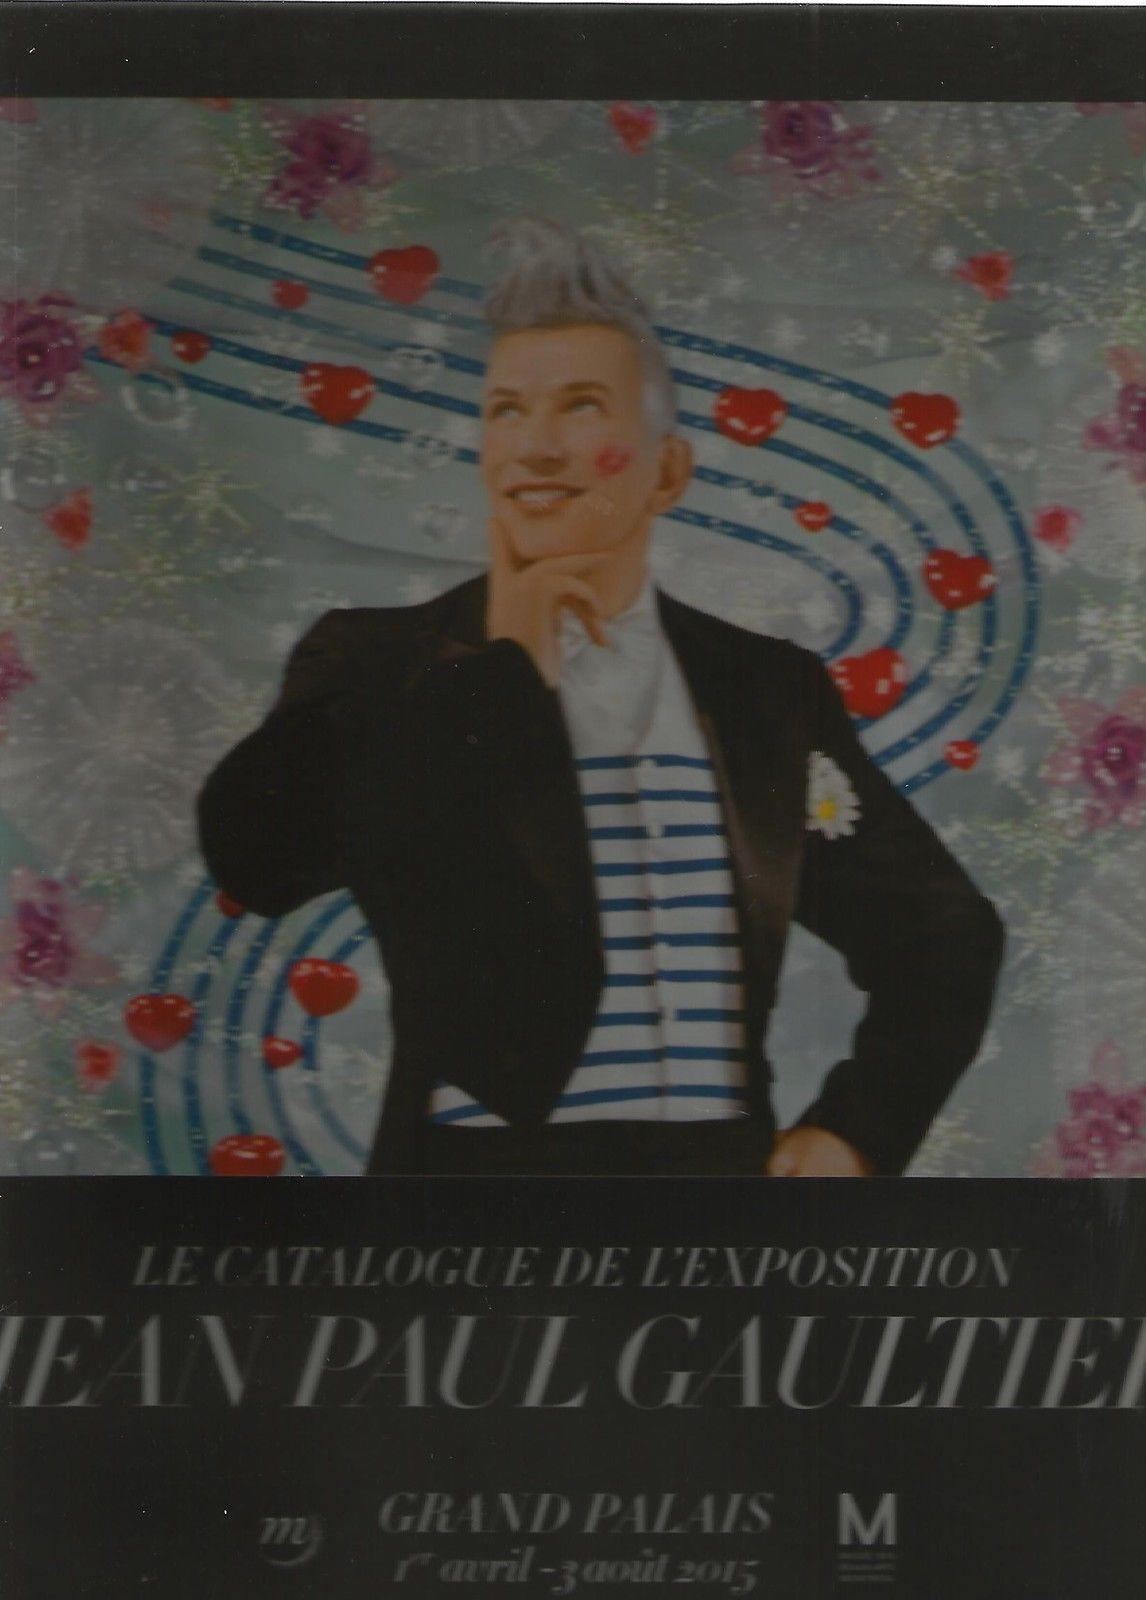 Mode Costume Catalogue D'Exposition Jean Paul Gaultier 2015 Grand Palais Paris   eBay